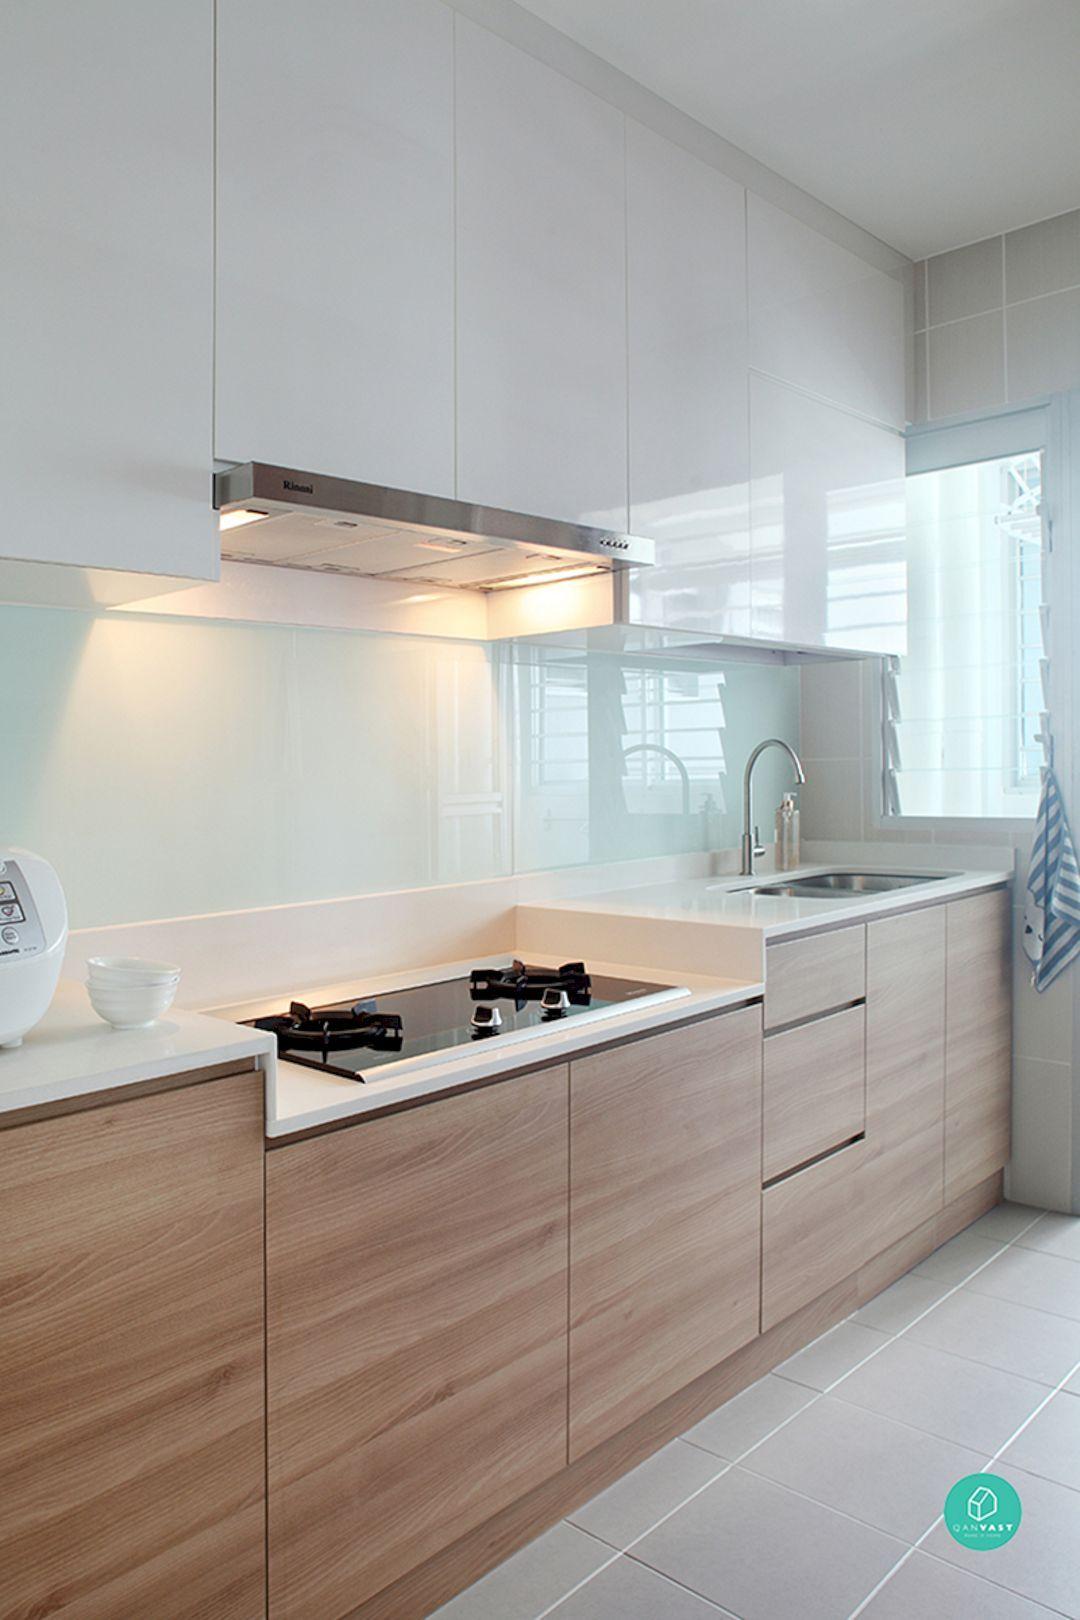 Stylish Modern Kitchen Cabinet: 127 Design Ideas | σπιτι | Pinterest on kitchens with oak trim, kitchens with oak flooring, kitchens with oak floors,